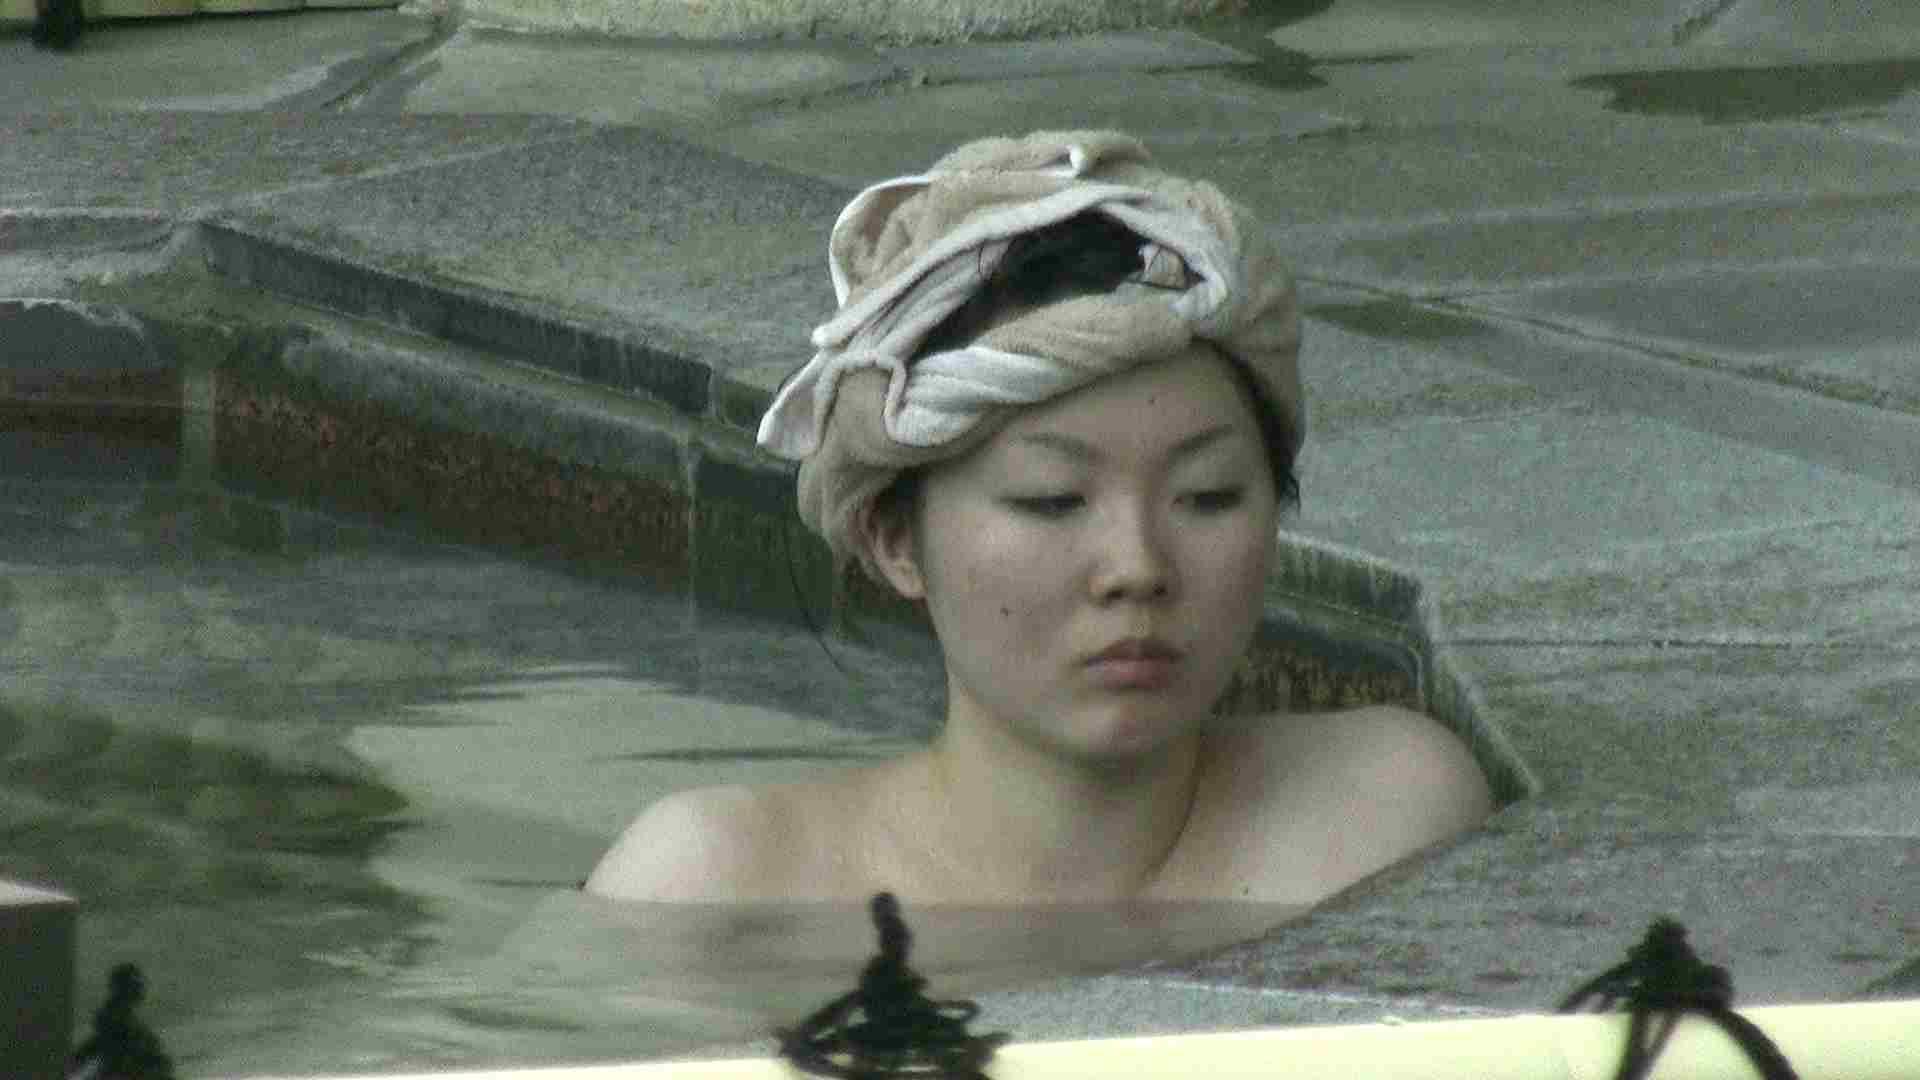 Aquaな露天風呂Vol.191 露天 | OL女体  72連発 70